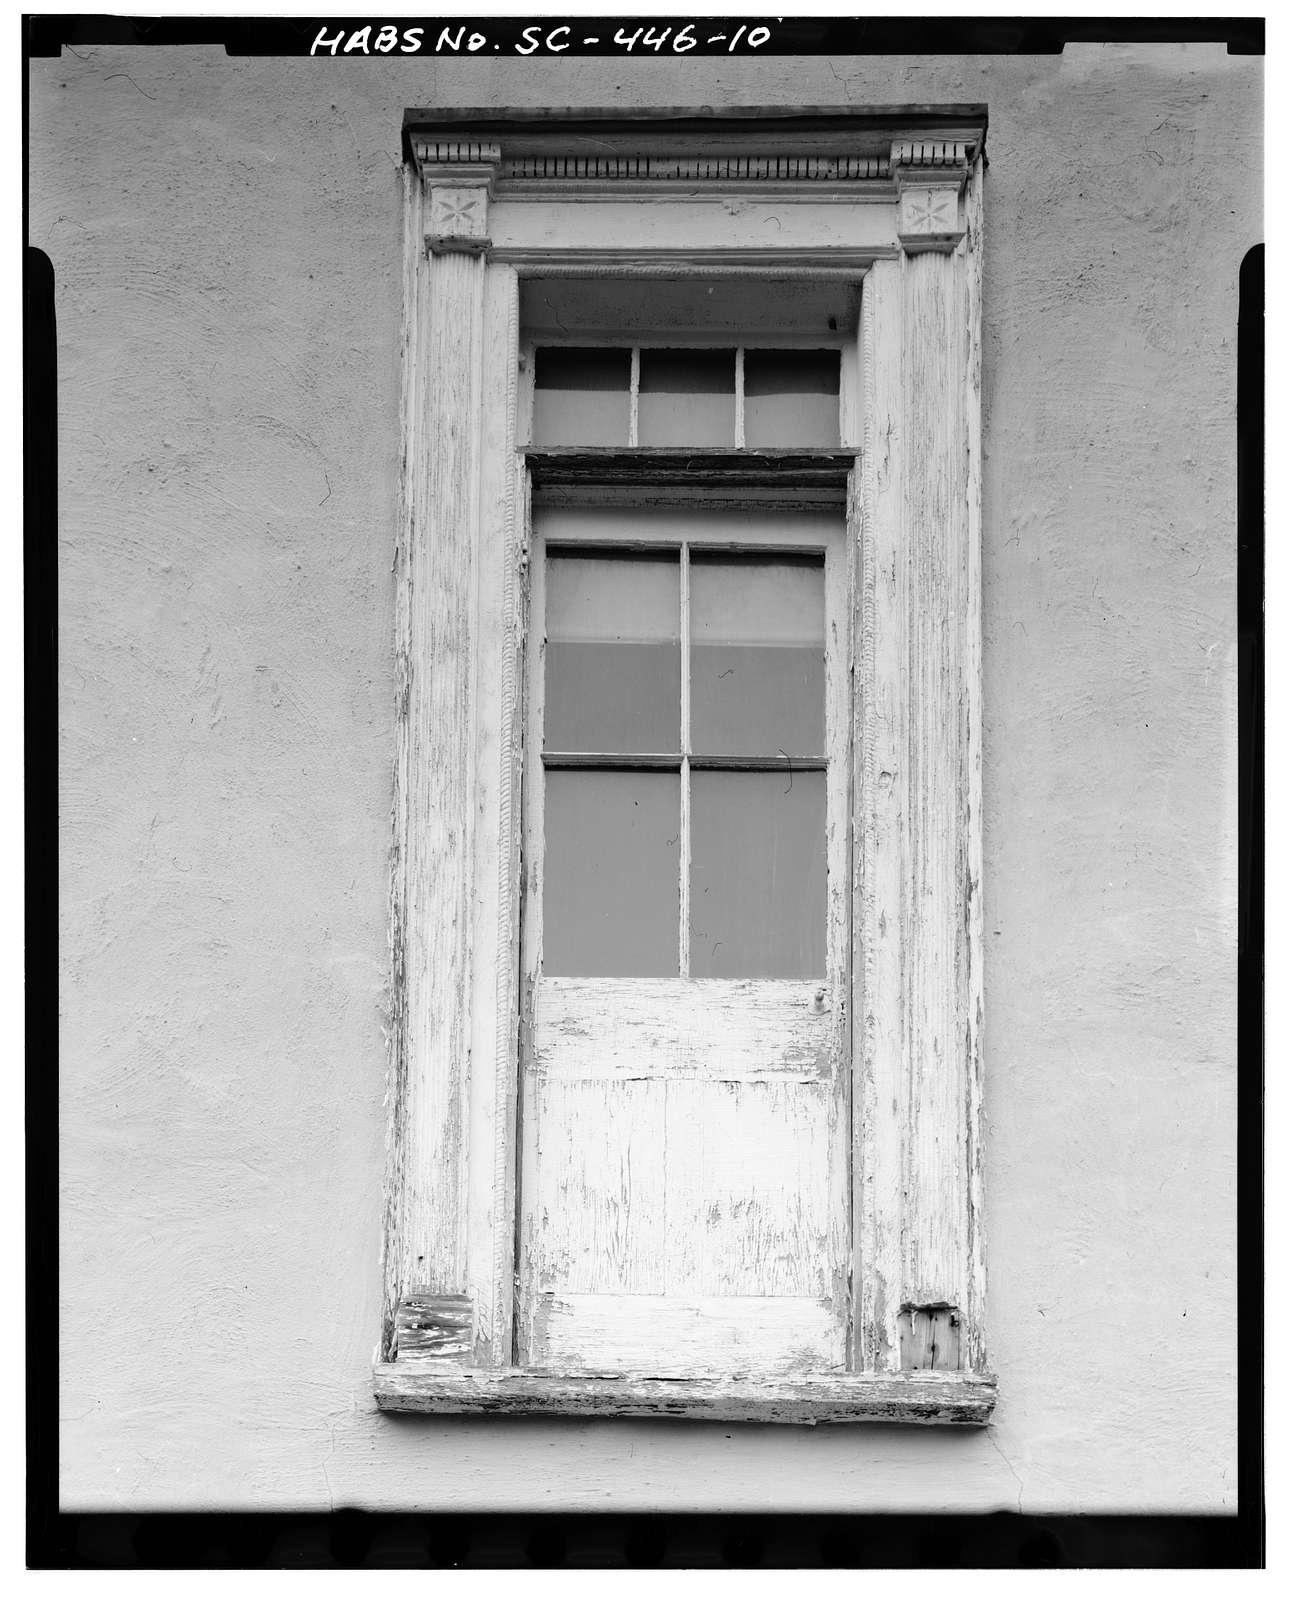 8 Court House Square (House), Charleston, Charleston County, SC